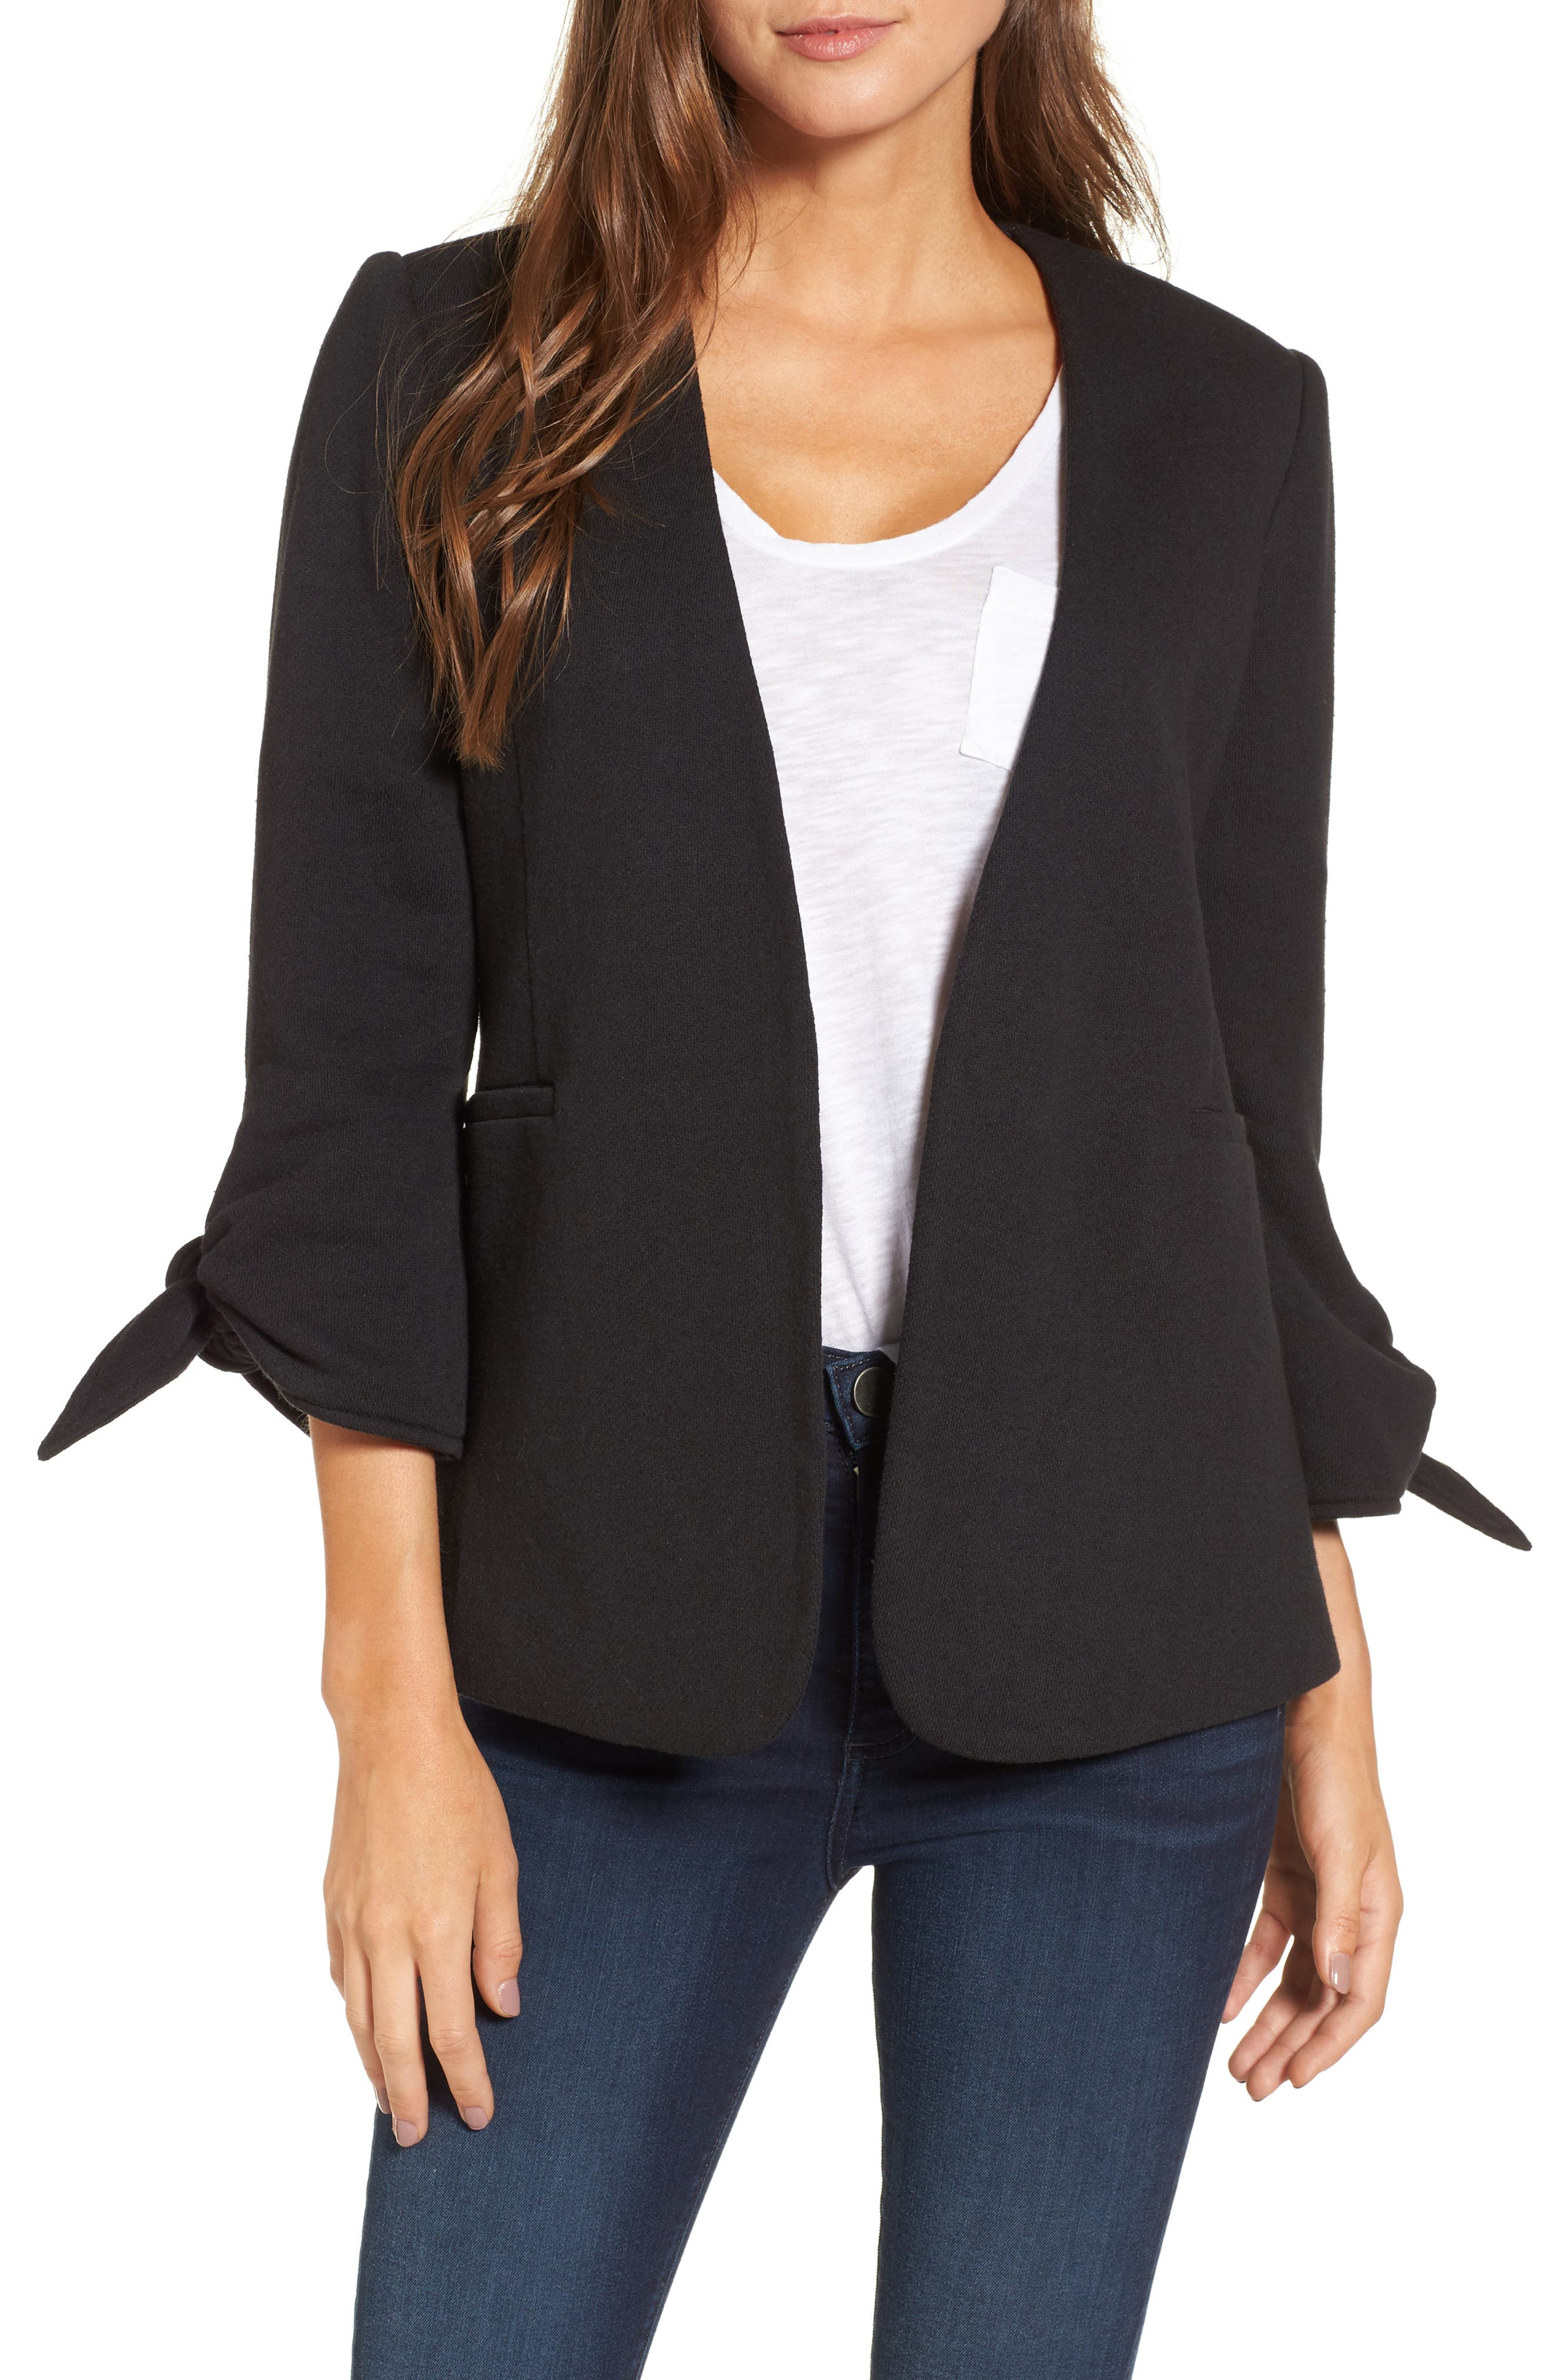 57f19cc86d64 Beige Tuxedo Style Blazer For Women